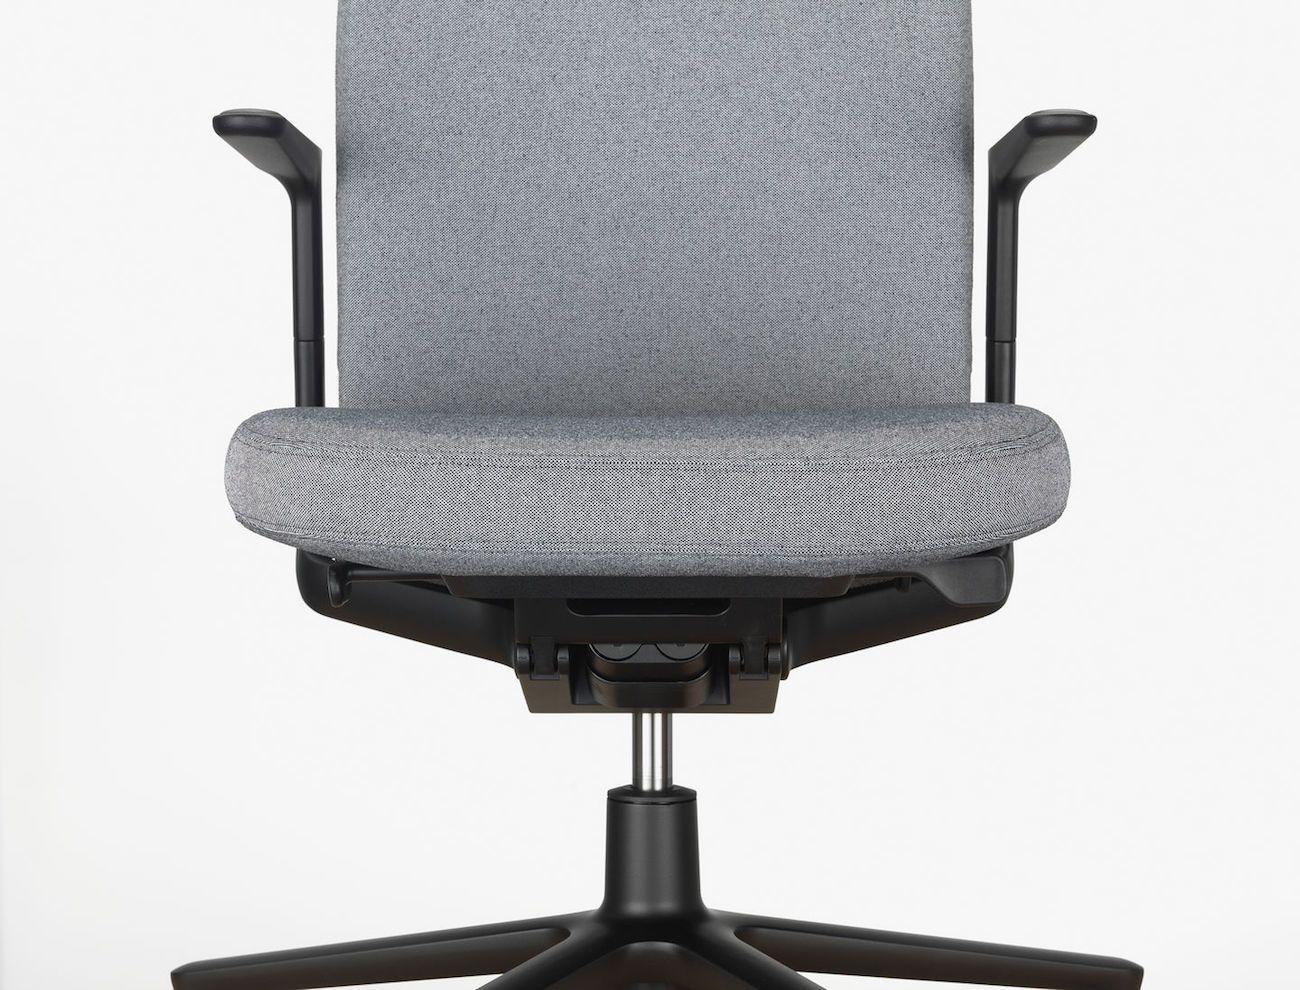 Pleasing Vitra Pacific Minimalist Desk Chair Cjindustries Chair Design For Home Cjindustriesco